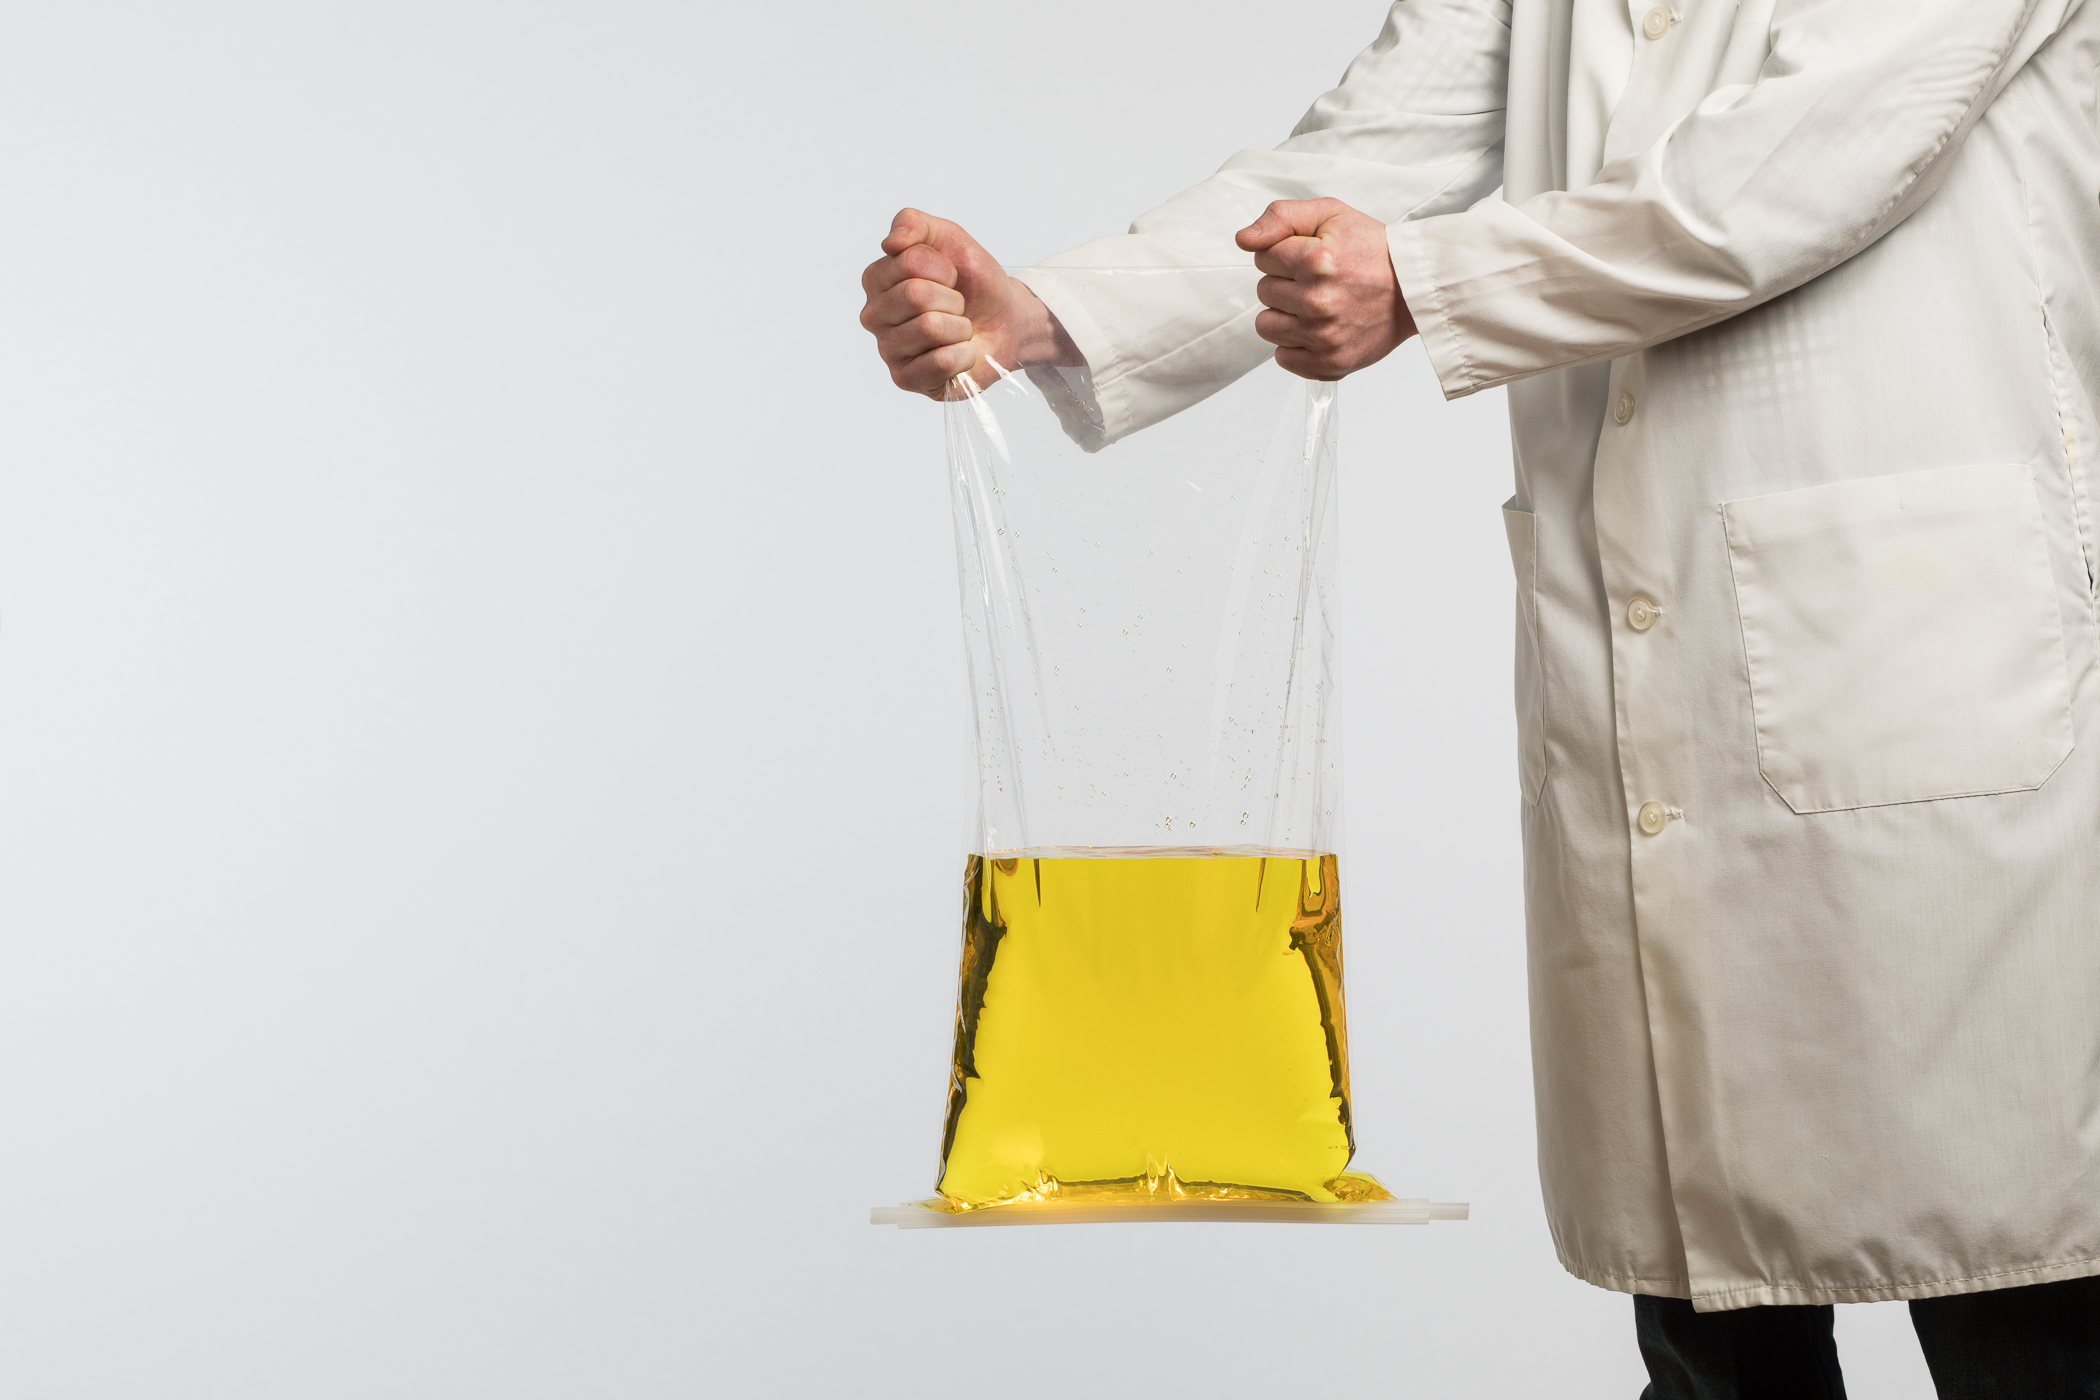 Clip-n-seal lay flat bag closures